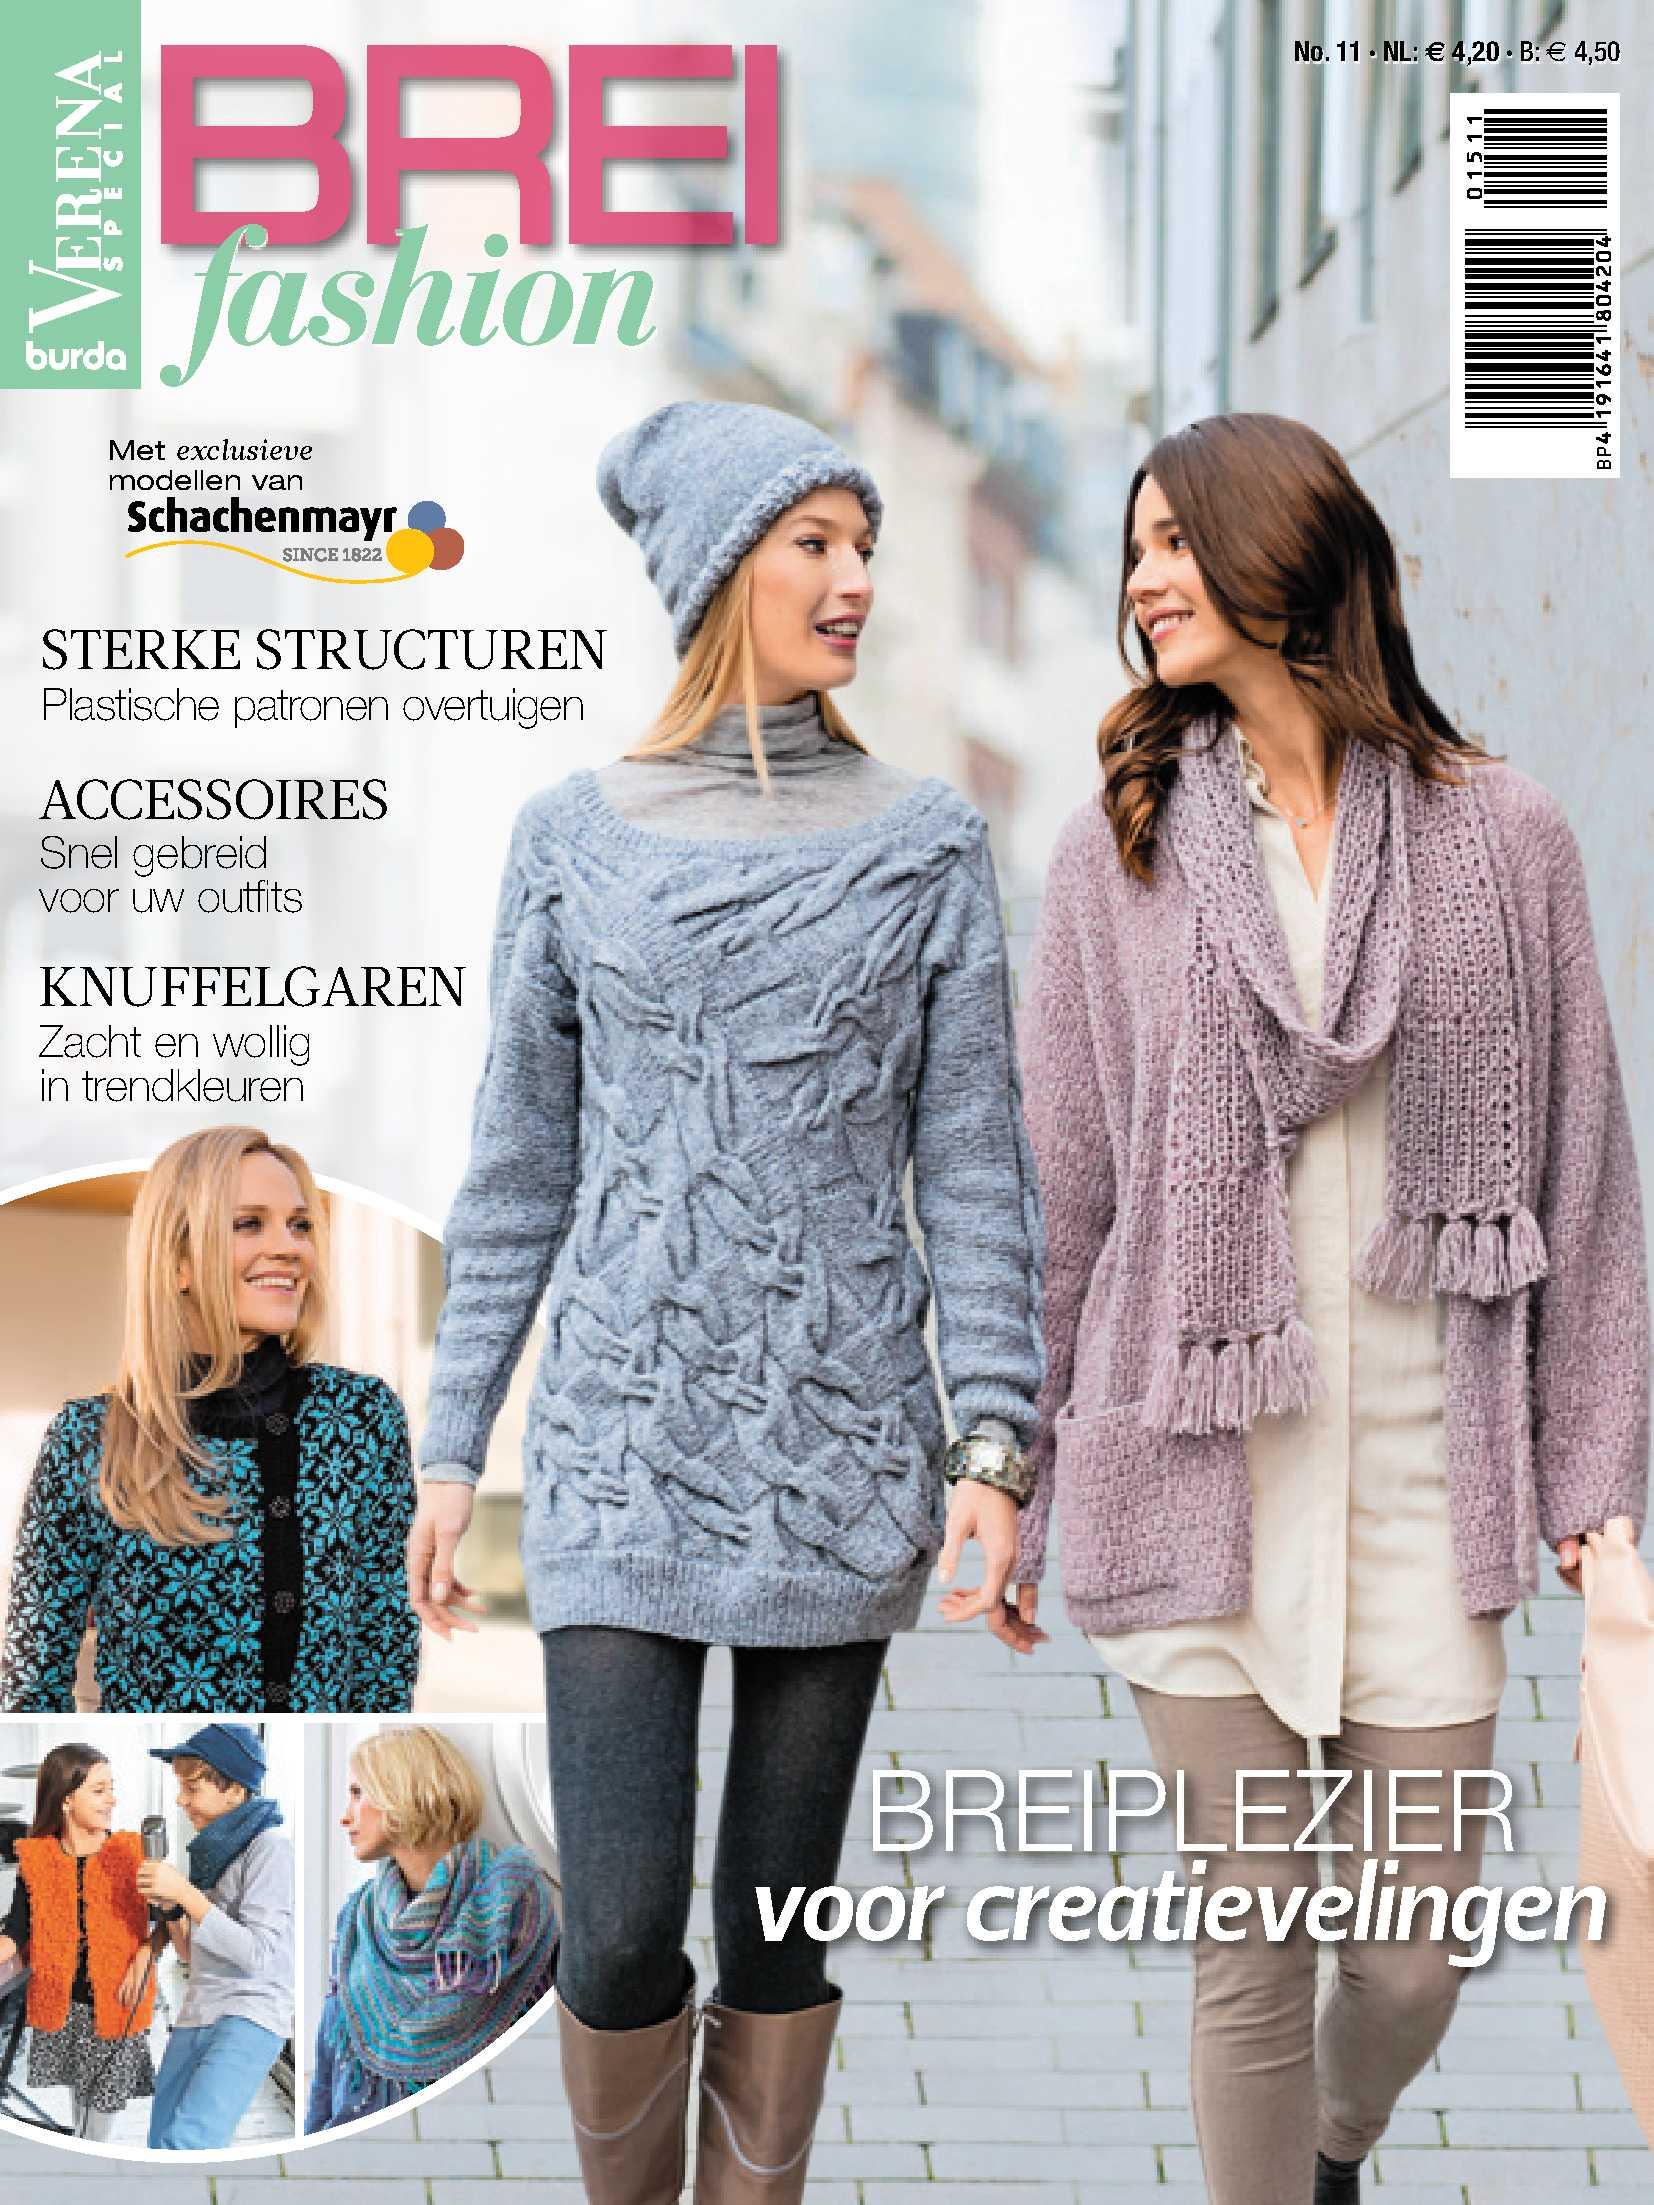 Verena Specia Brei Fashion nr. 11